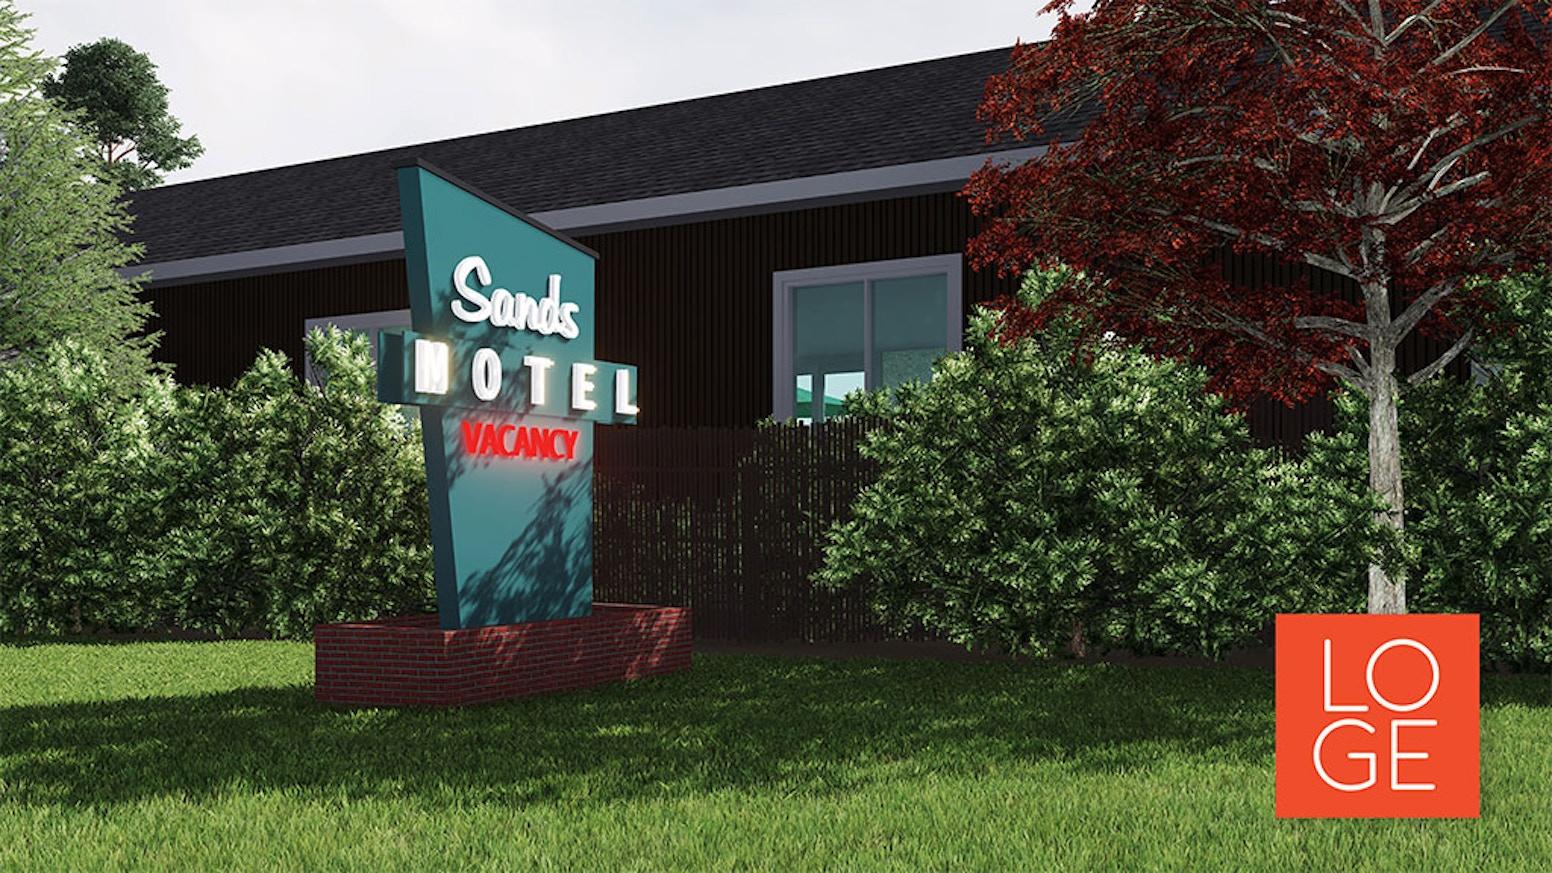 LOGE Camp and Motel by Johannes Ariens — Kickstarter